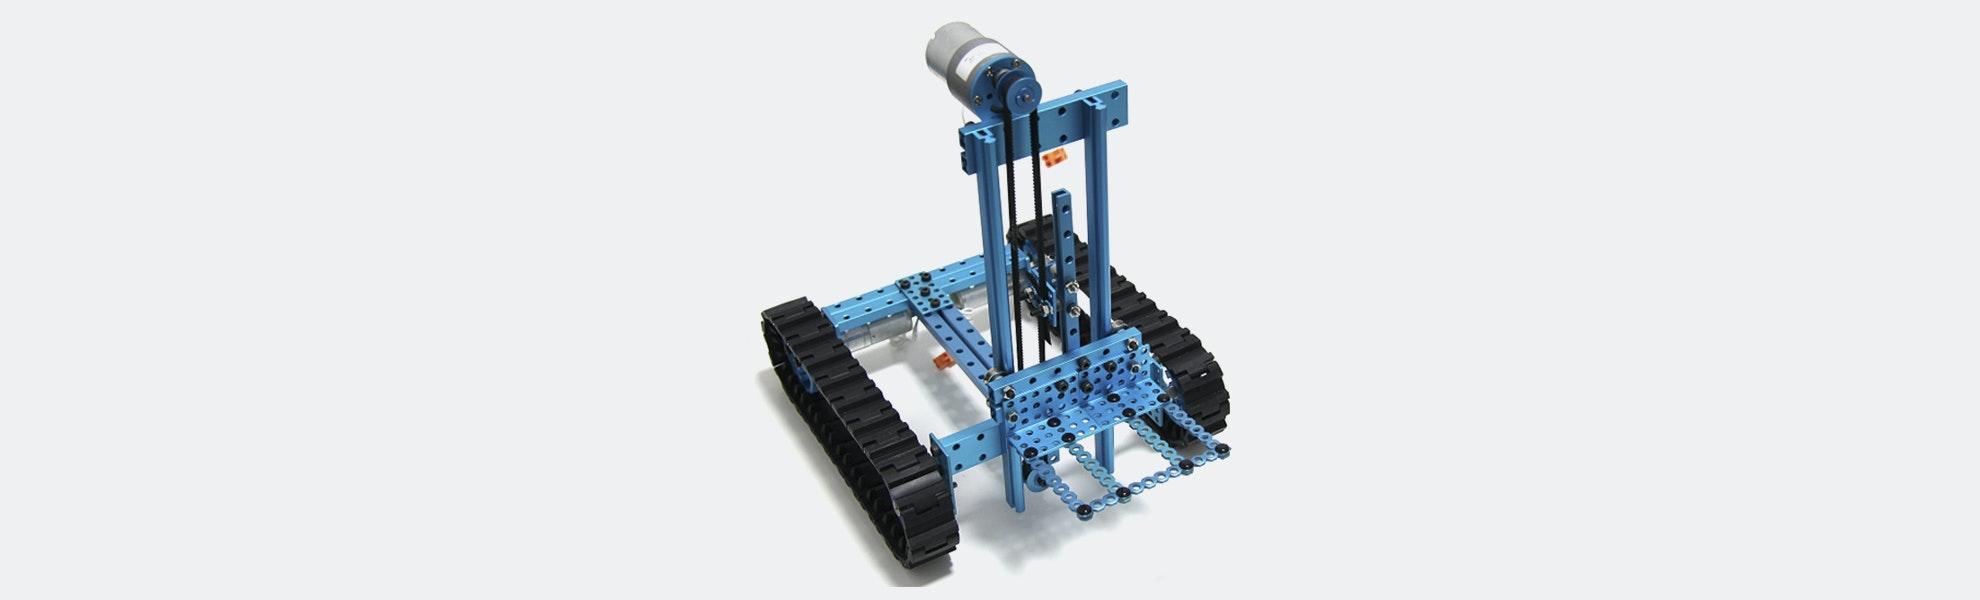 Makeblock Ultimate Robot Kit: Blue